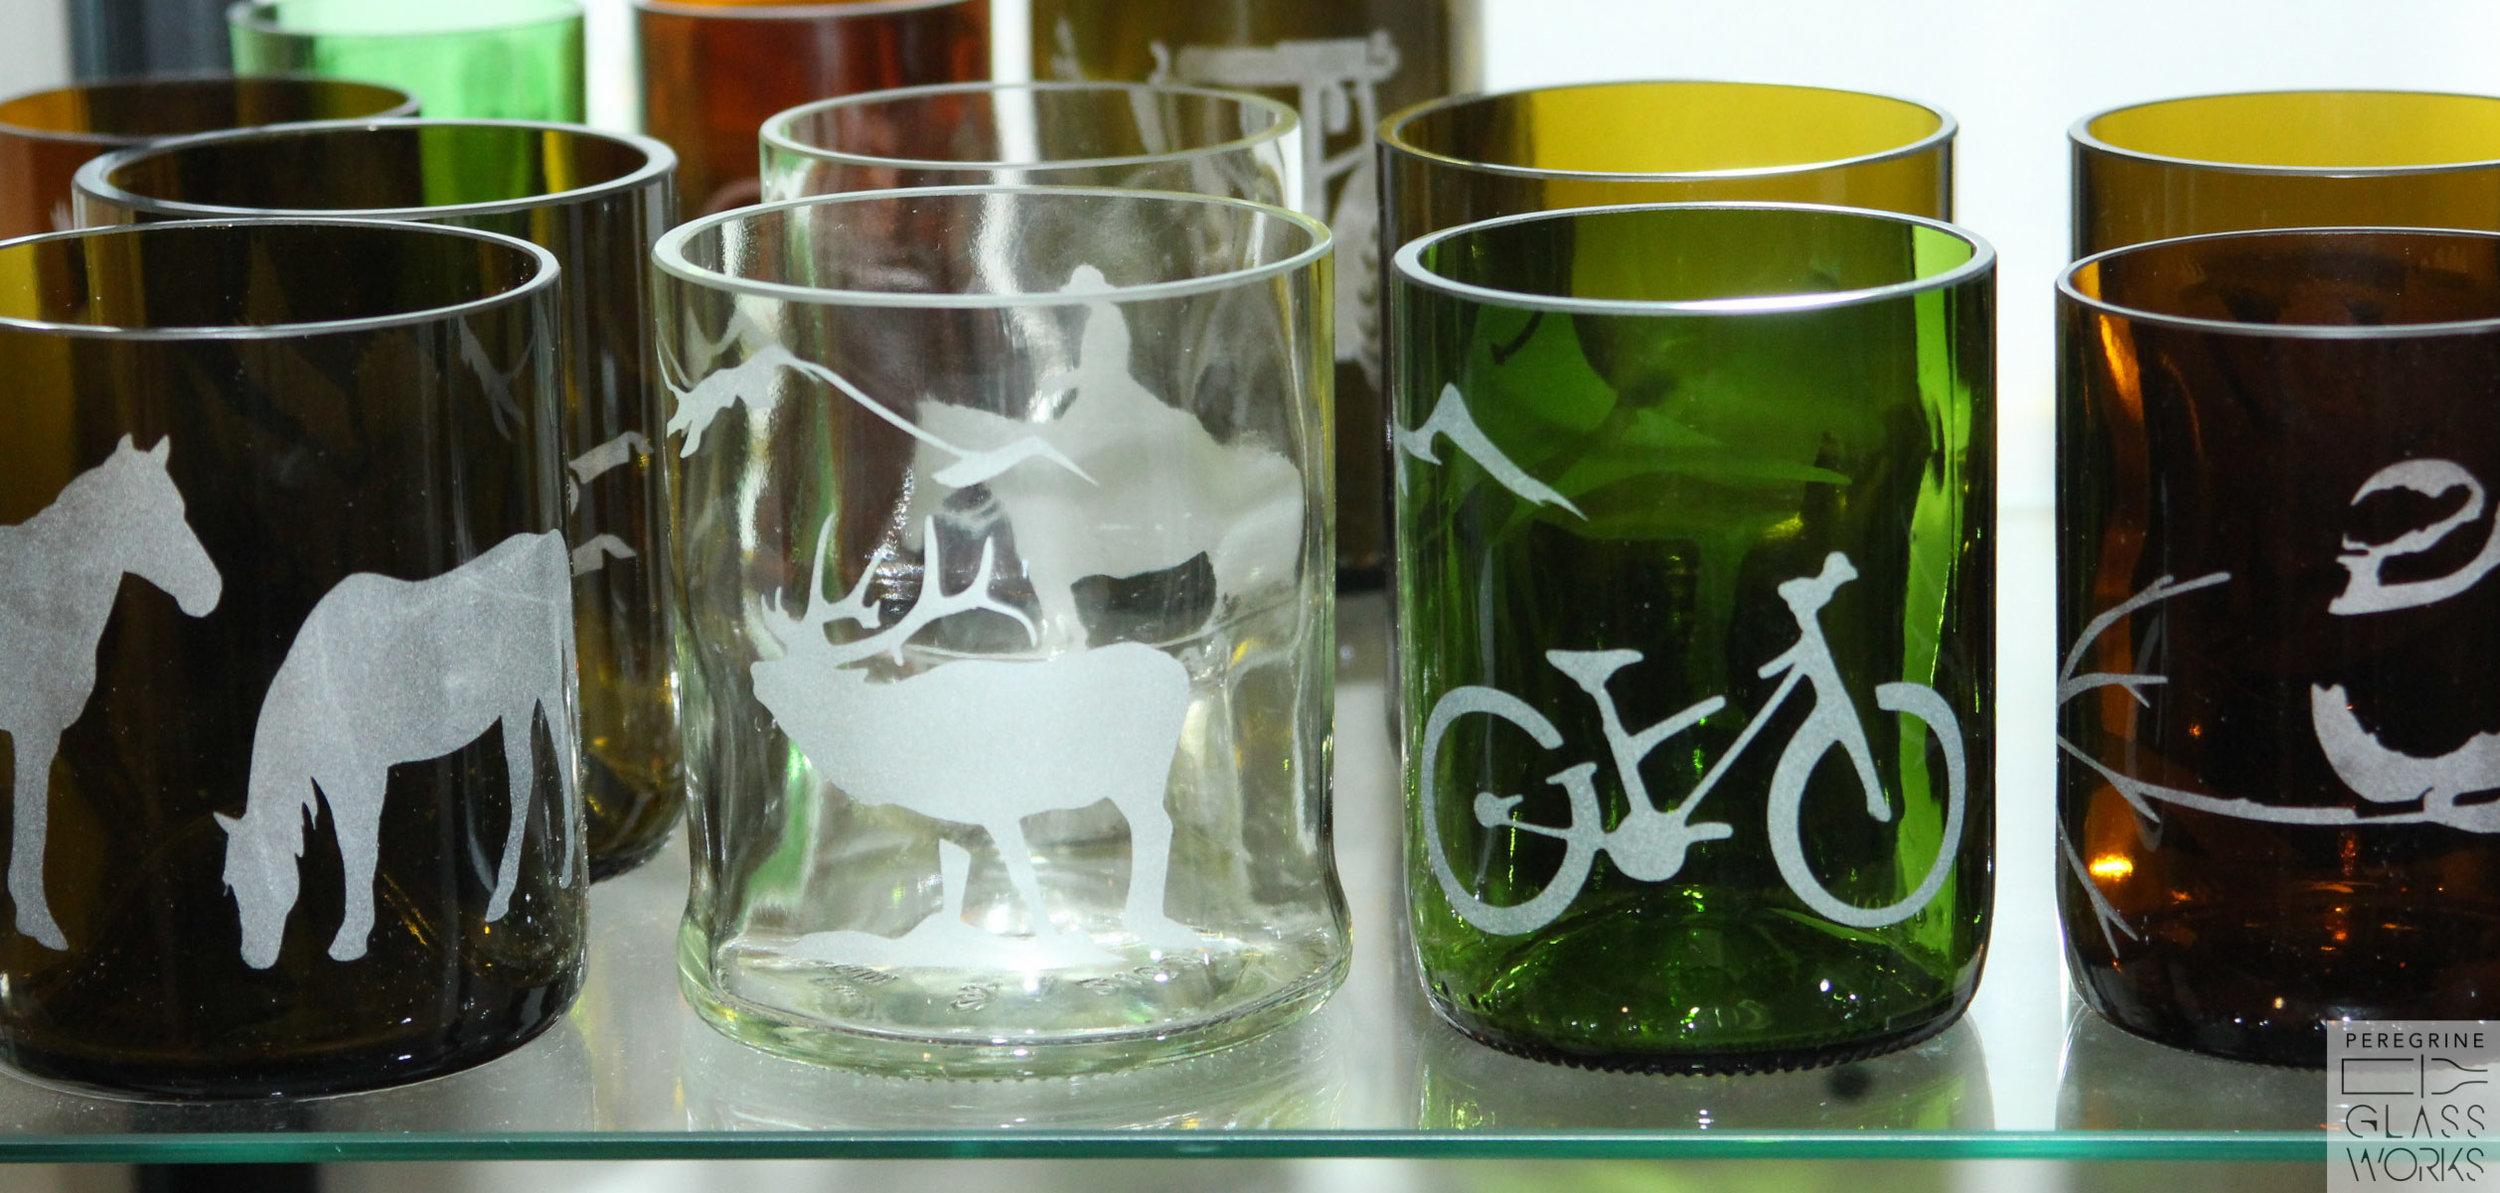 polishedglassesinstock-2.jpg